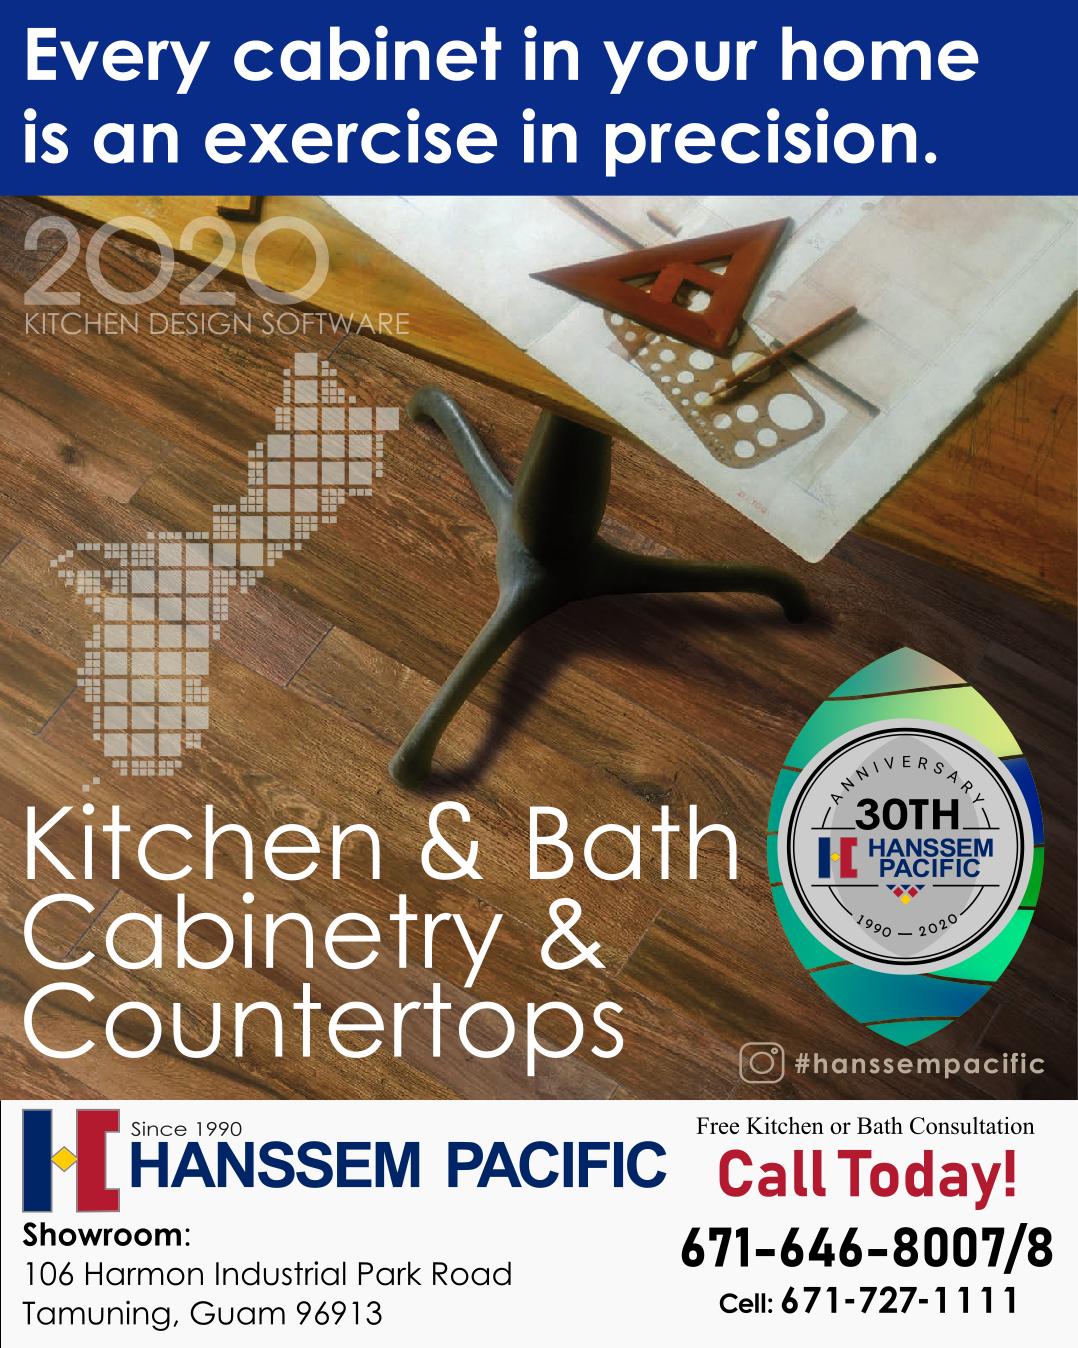 Kitchen Cabinets In 2020 Kitchen Design Software Home Storage Solutions Kitchen Cabinetry